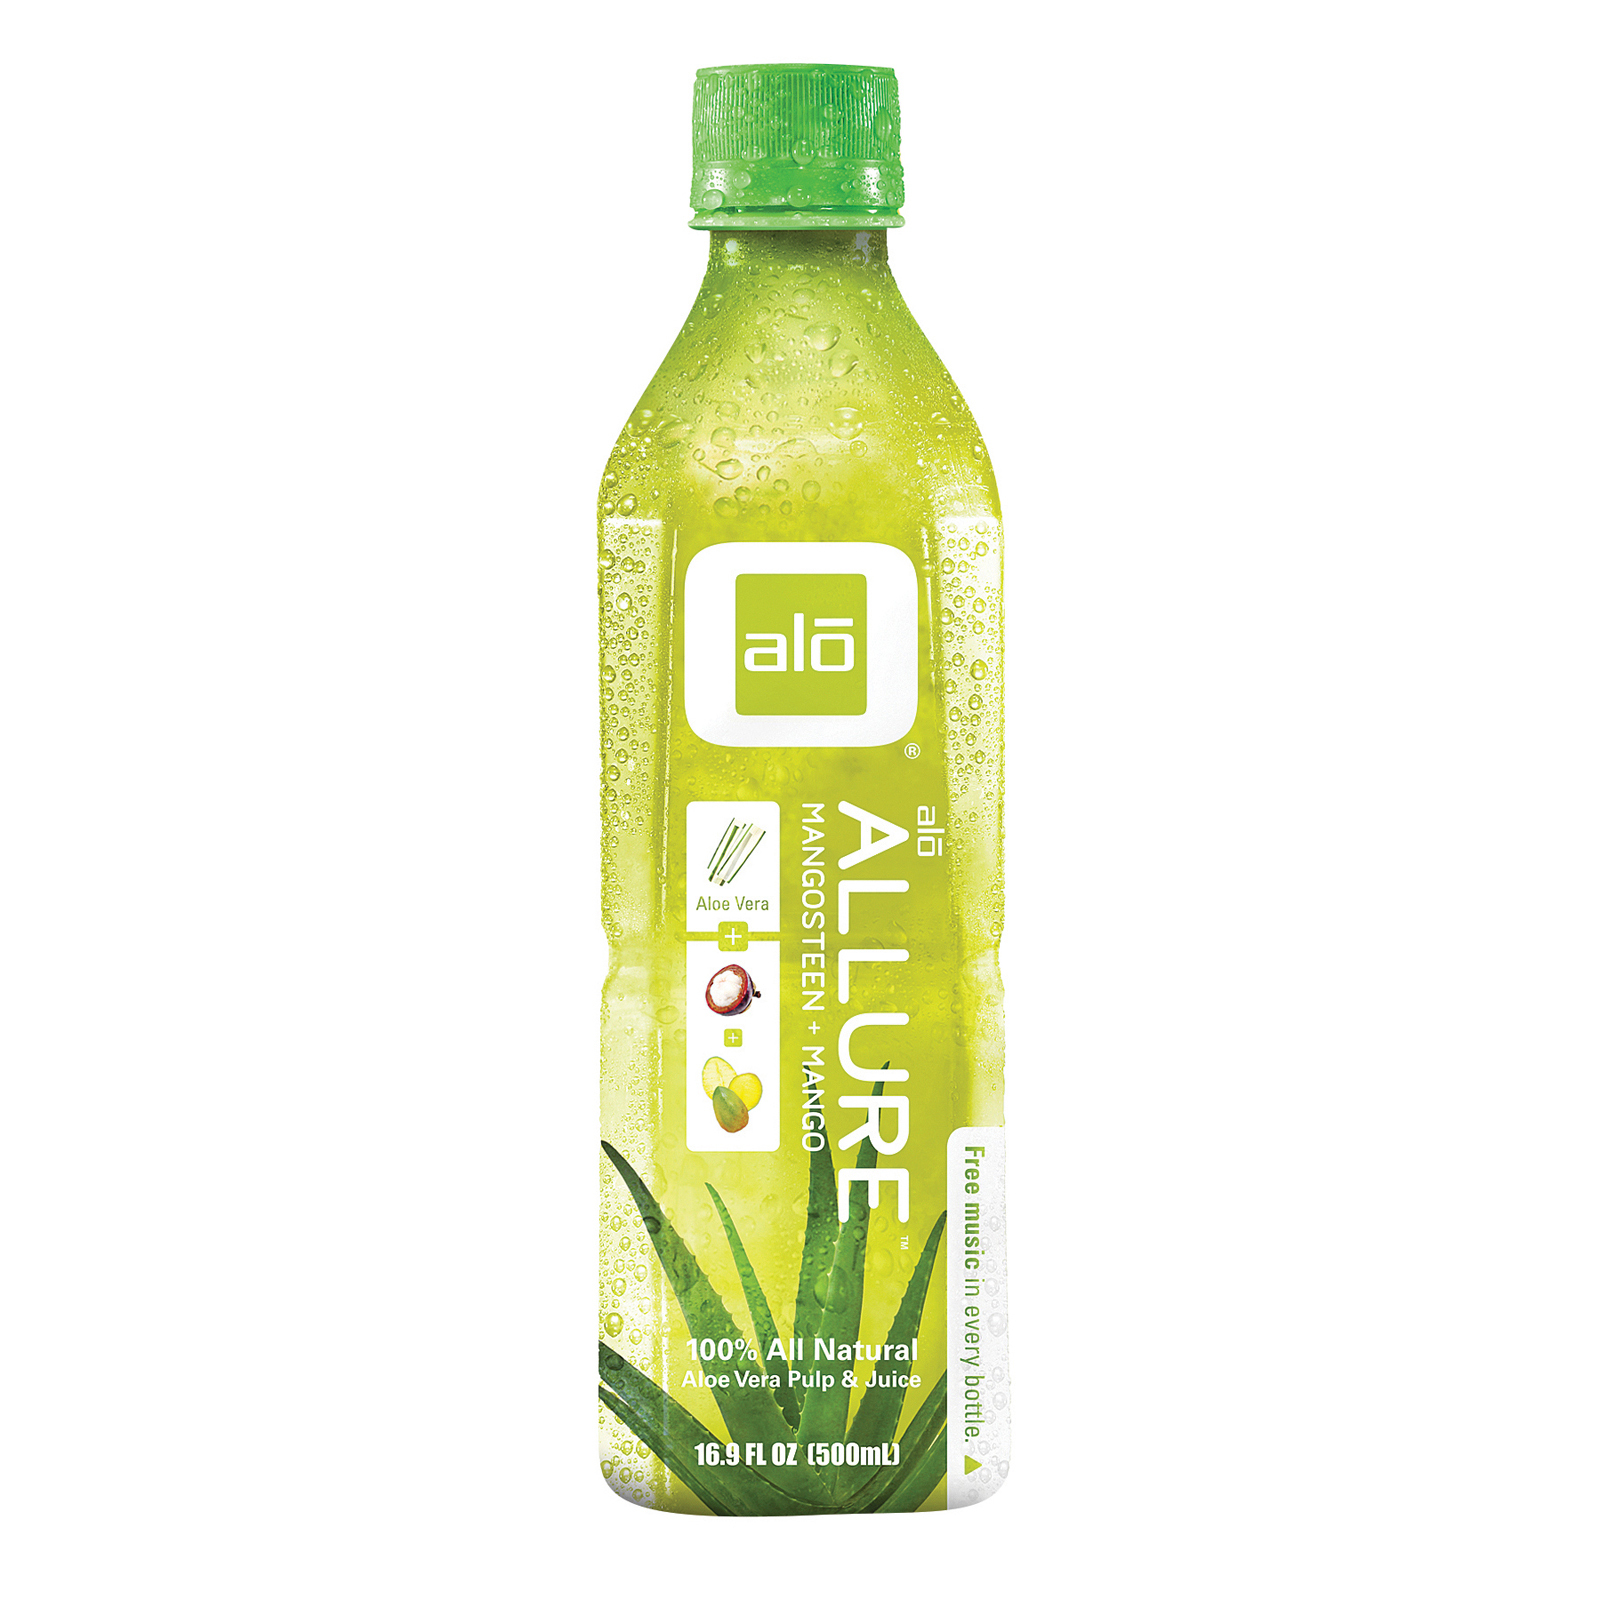 Alo Original Allure Aloe Vera Juice Drink - Mangosteen and Mango - Case of 12 - 16.9 fl oz.